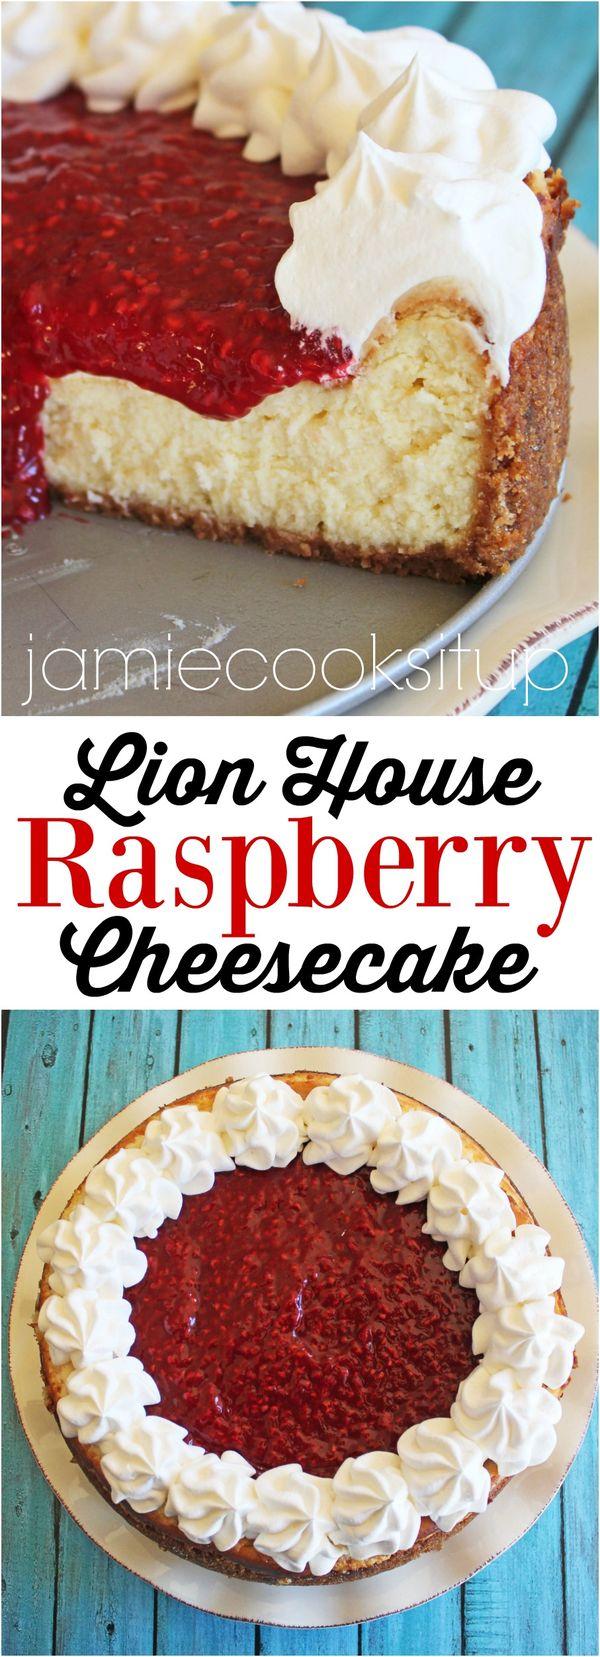 Lion House Raspberry Cheesecake (Renewed